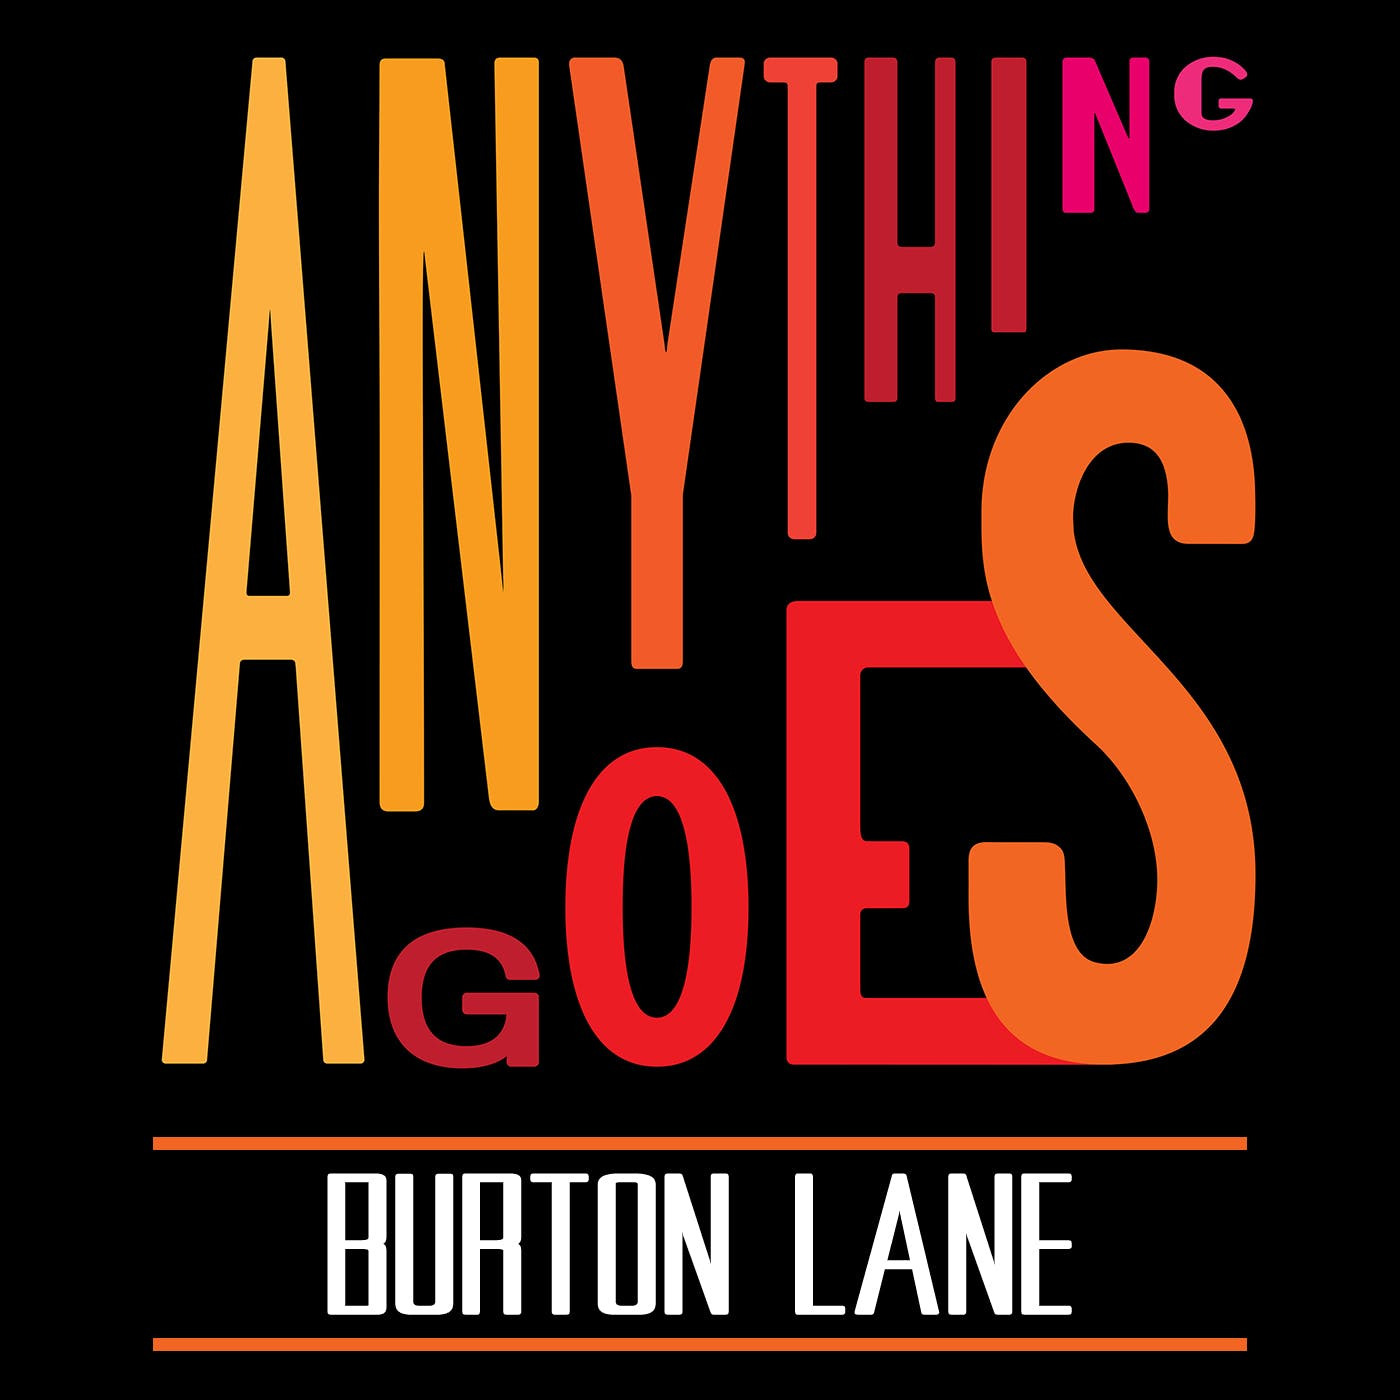 15 Burton Lane